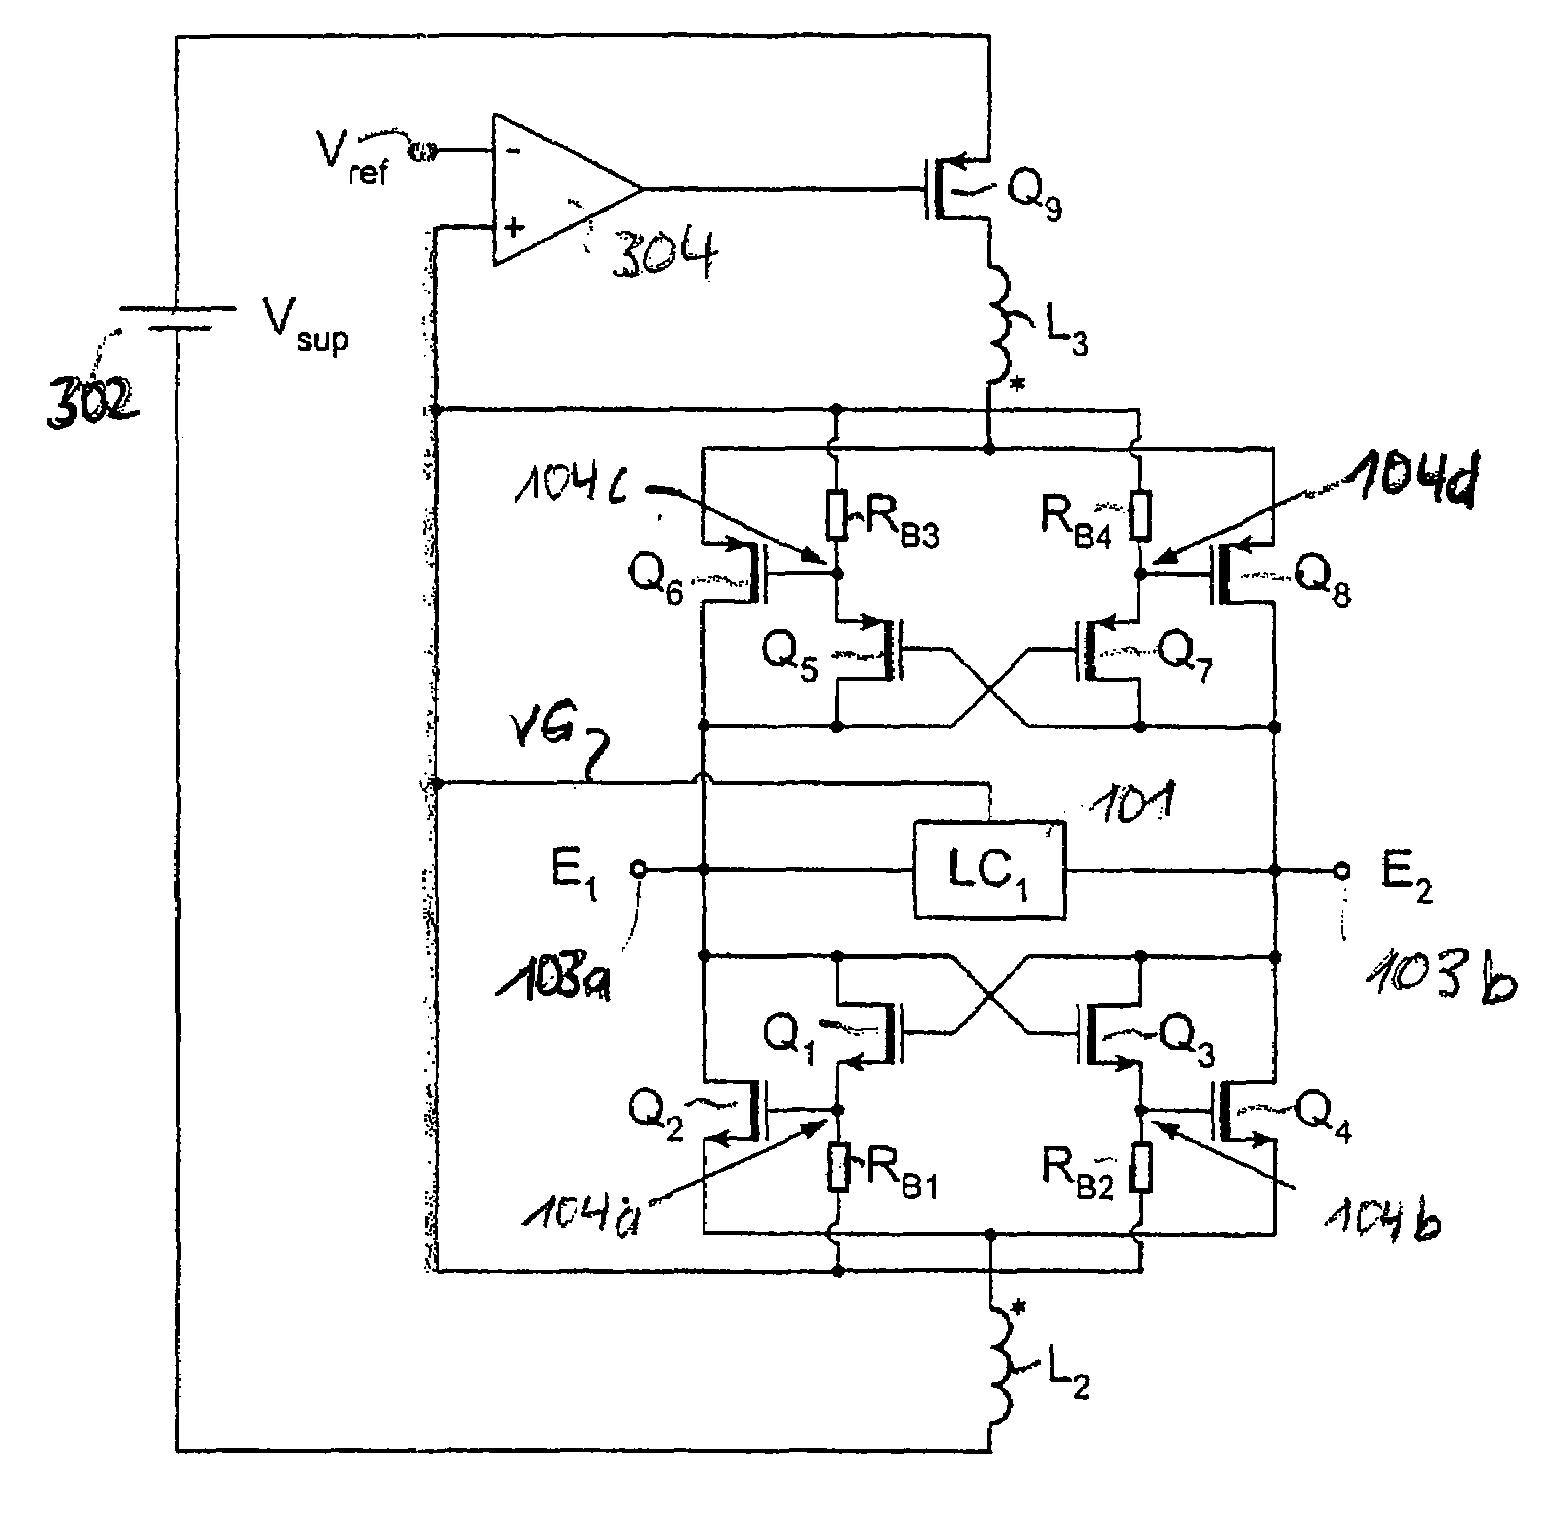 Patent Us7701303 Oscillator With Darlington Nodes Google Patents Pair Circuit Drawing